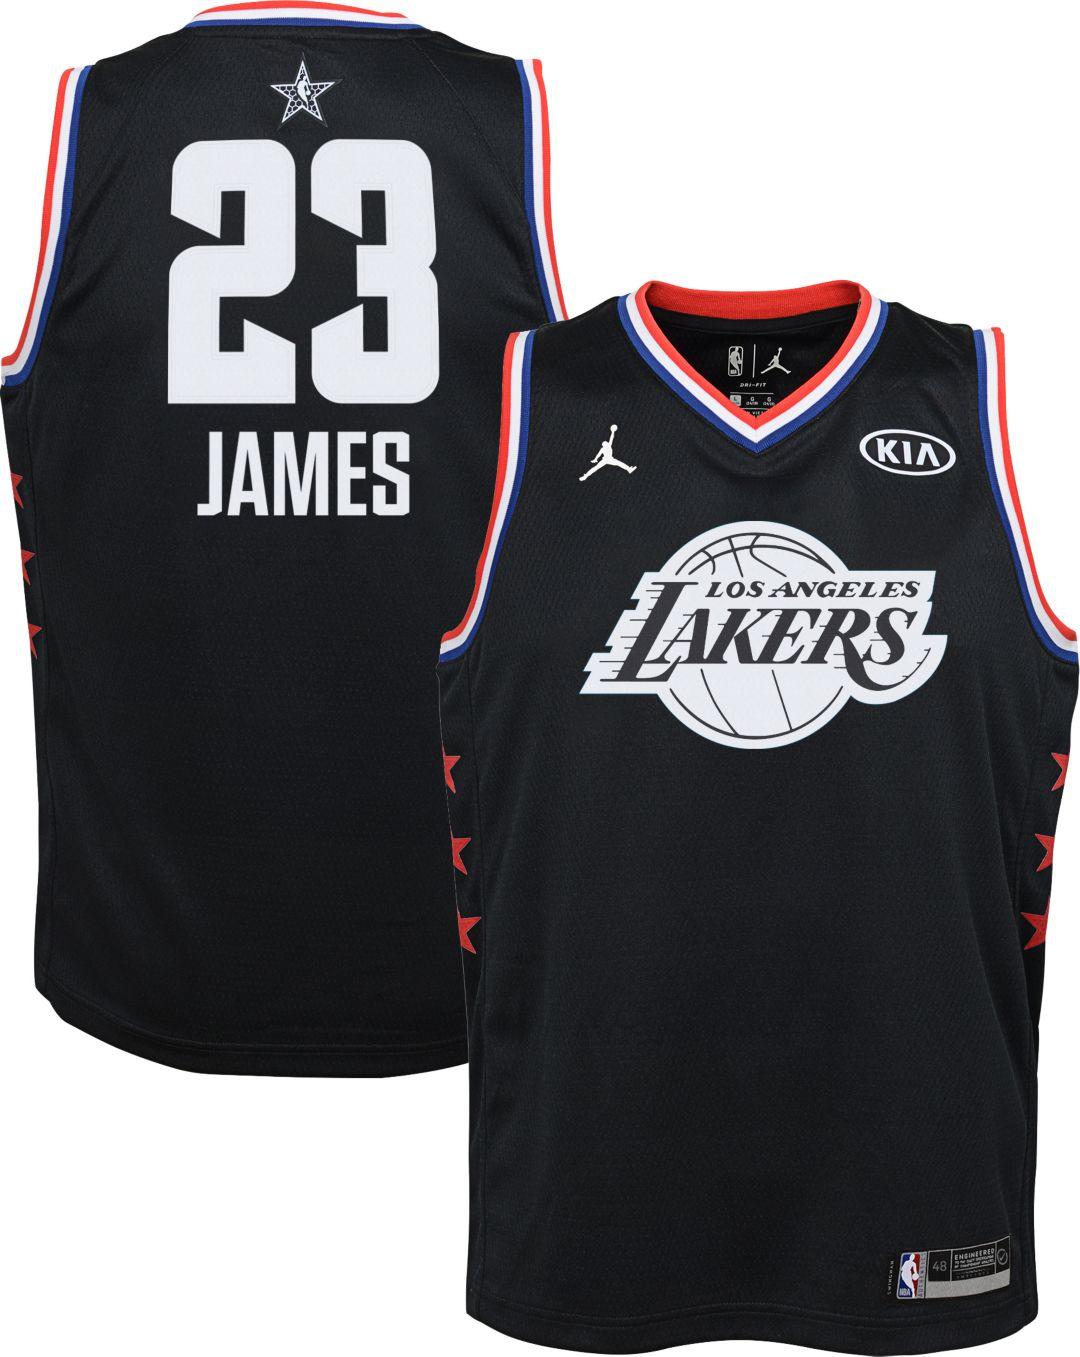 dbf0f4ab8 Jordan Youth 2019 NBA All-Star Game LeBron James Black Dri-FIT Swingman  Jersey. noImageFound. Previous